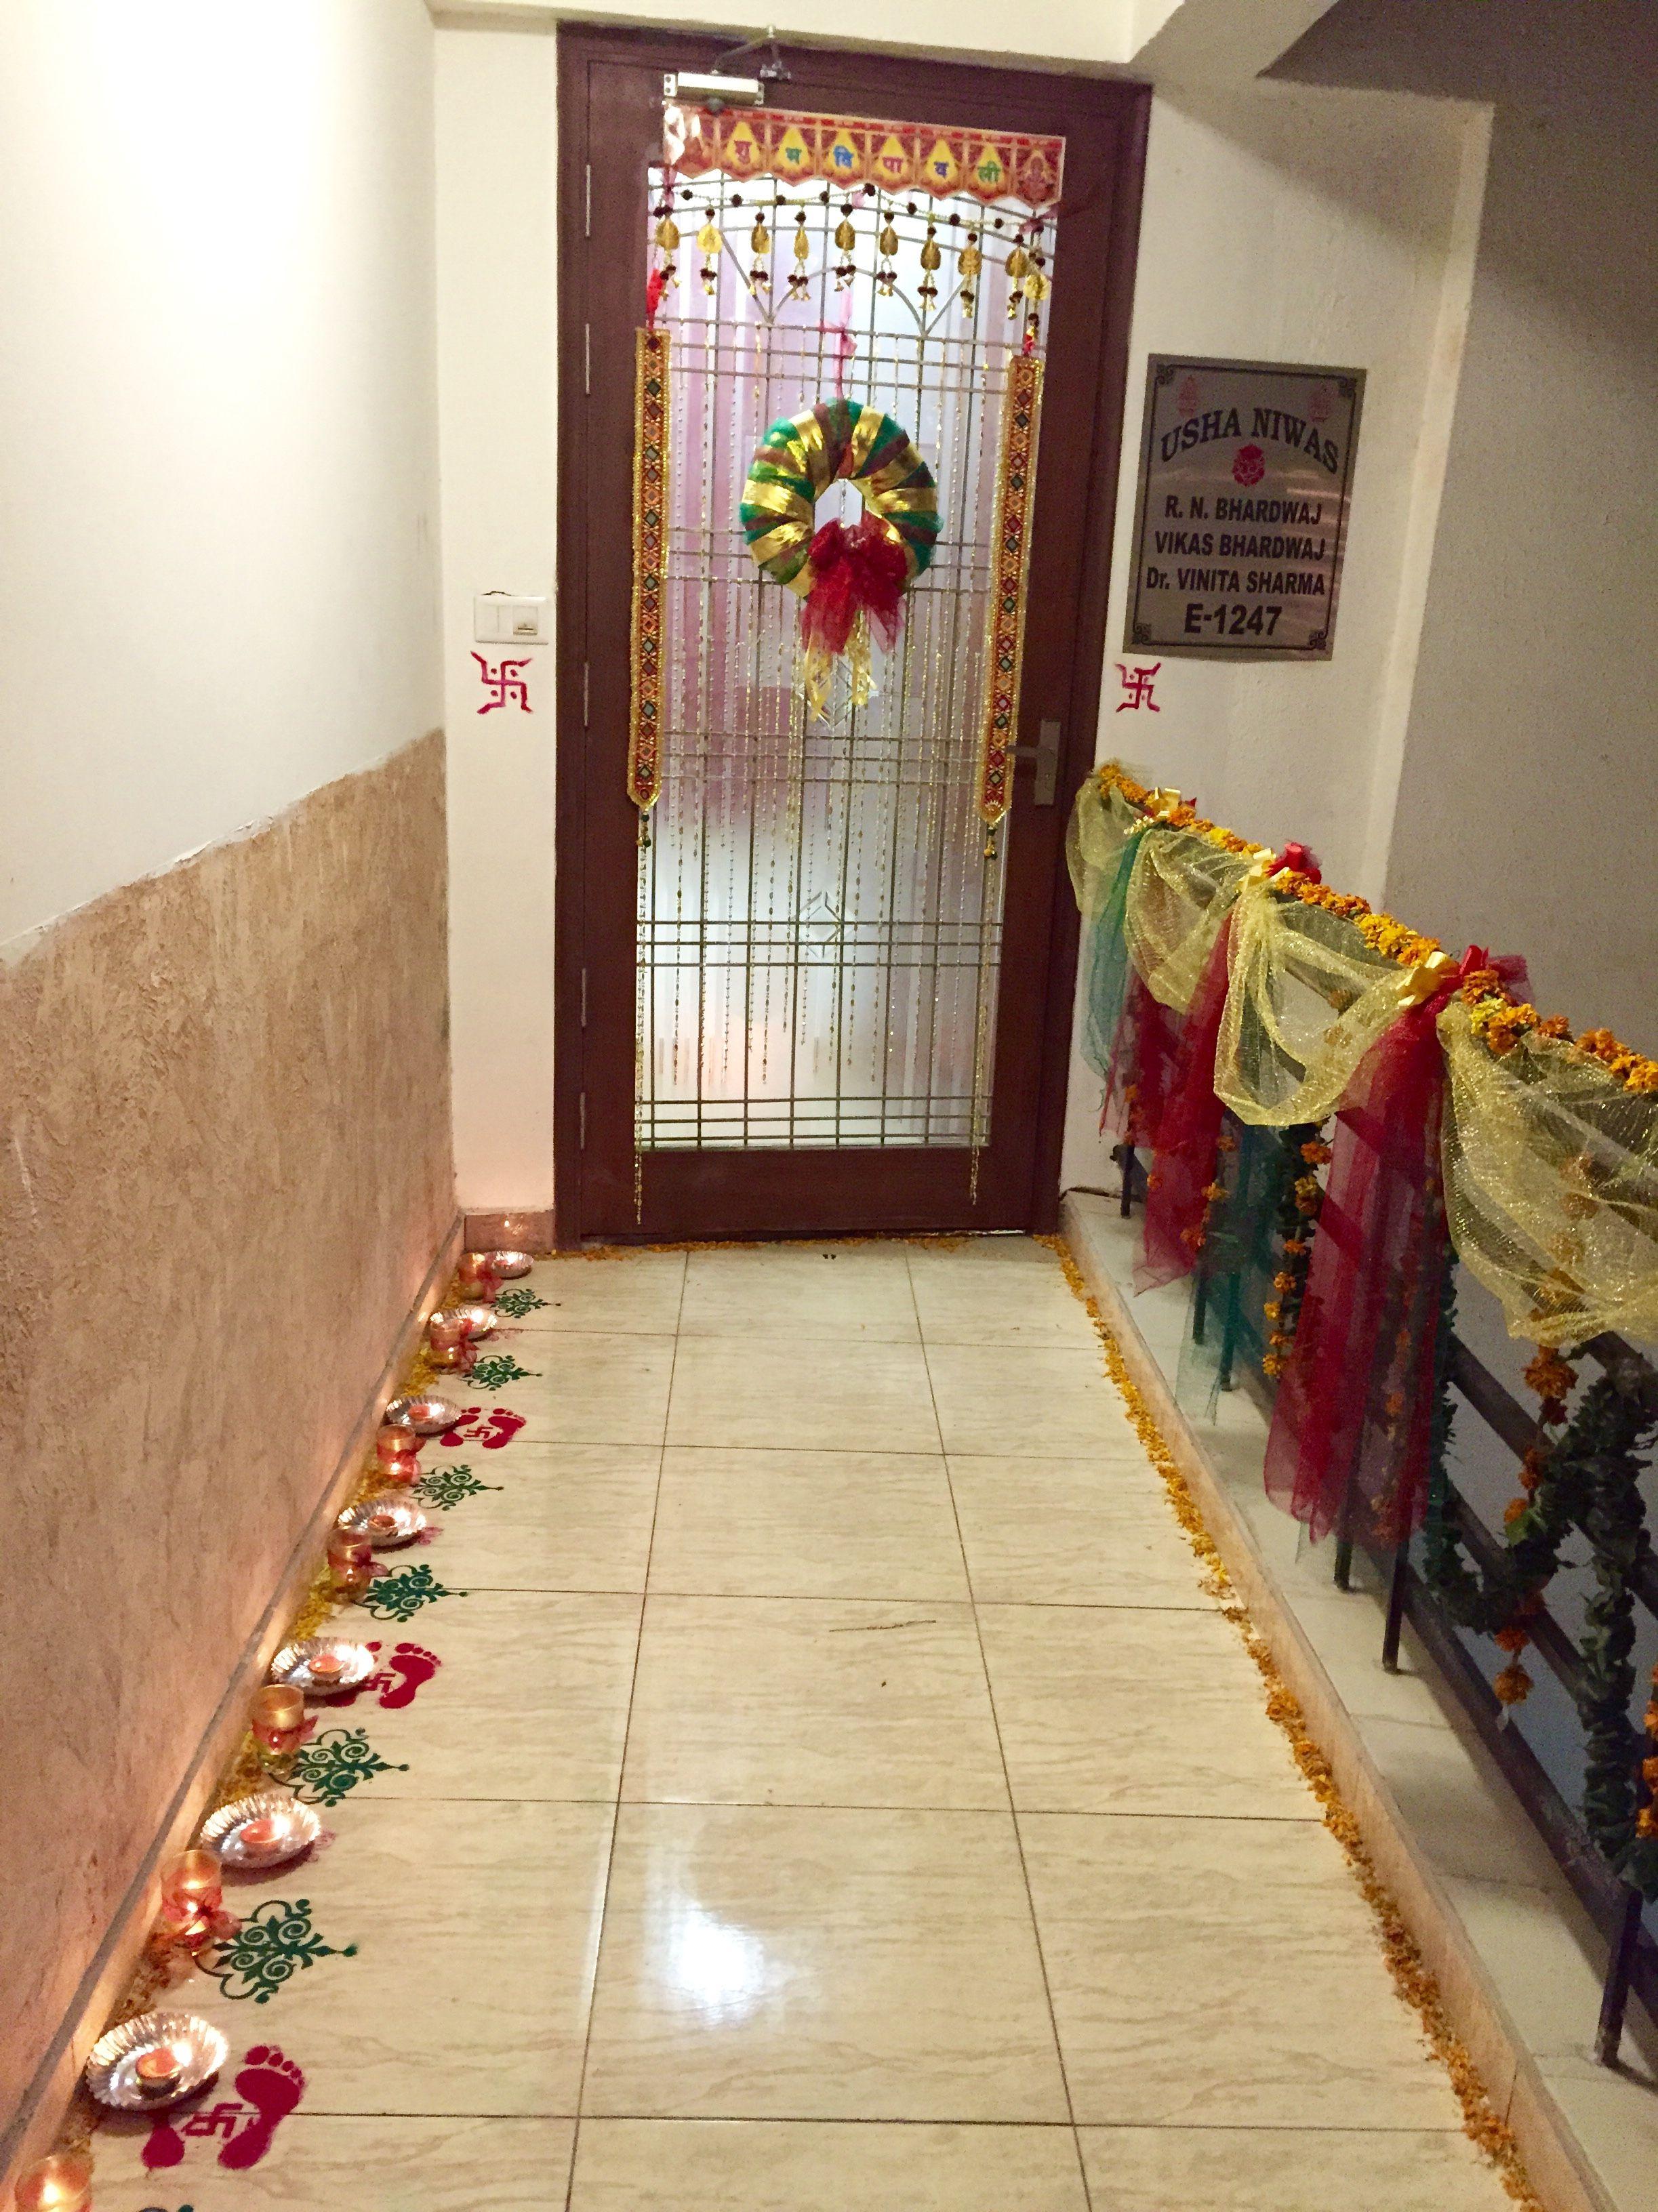 Entrance Decorations For Diwali Wreath Rangoli Candles And Divas Hipster Home Decor Trending Decor Home Decor Items Online